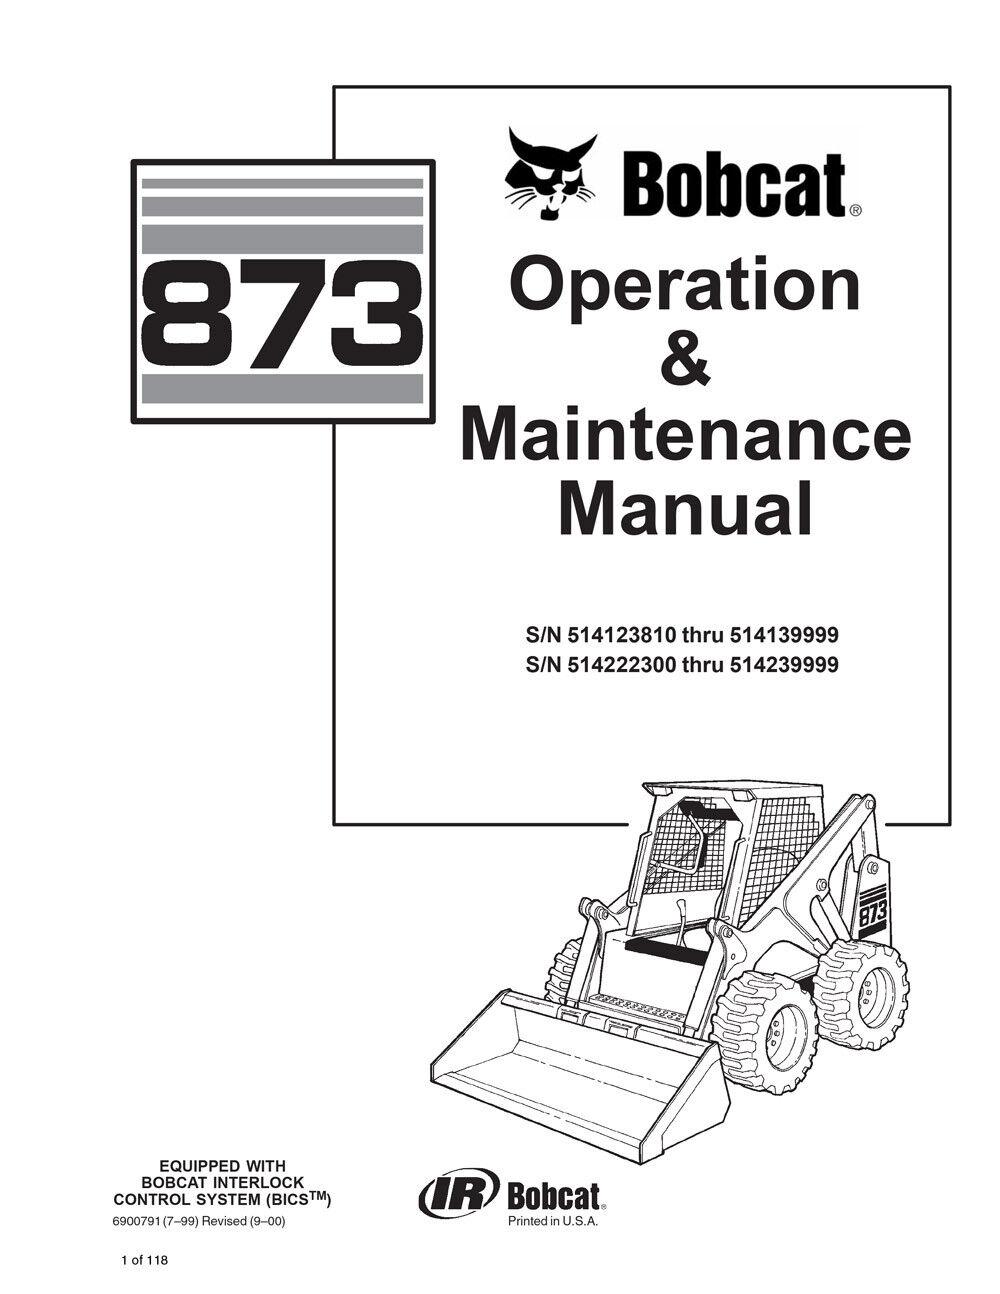 New Bobcat 873 Skid Steer Operation & Maintenance Manual